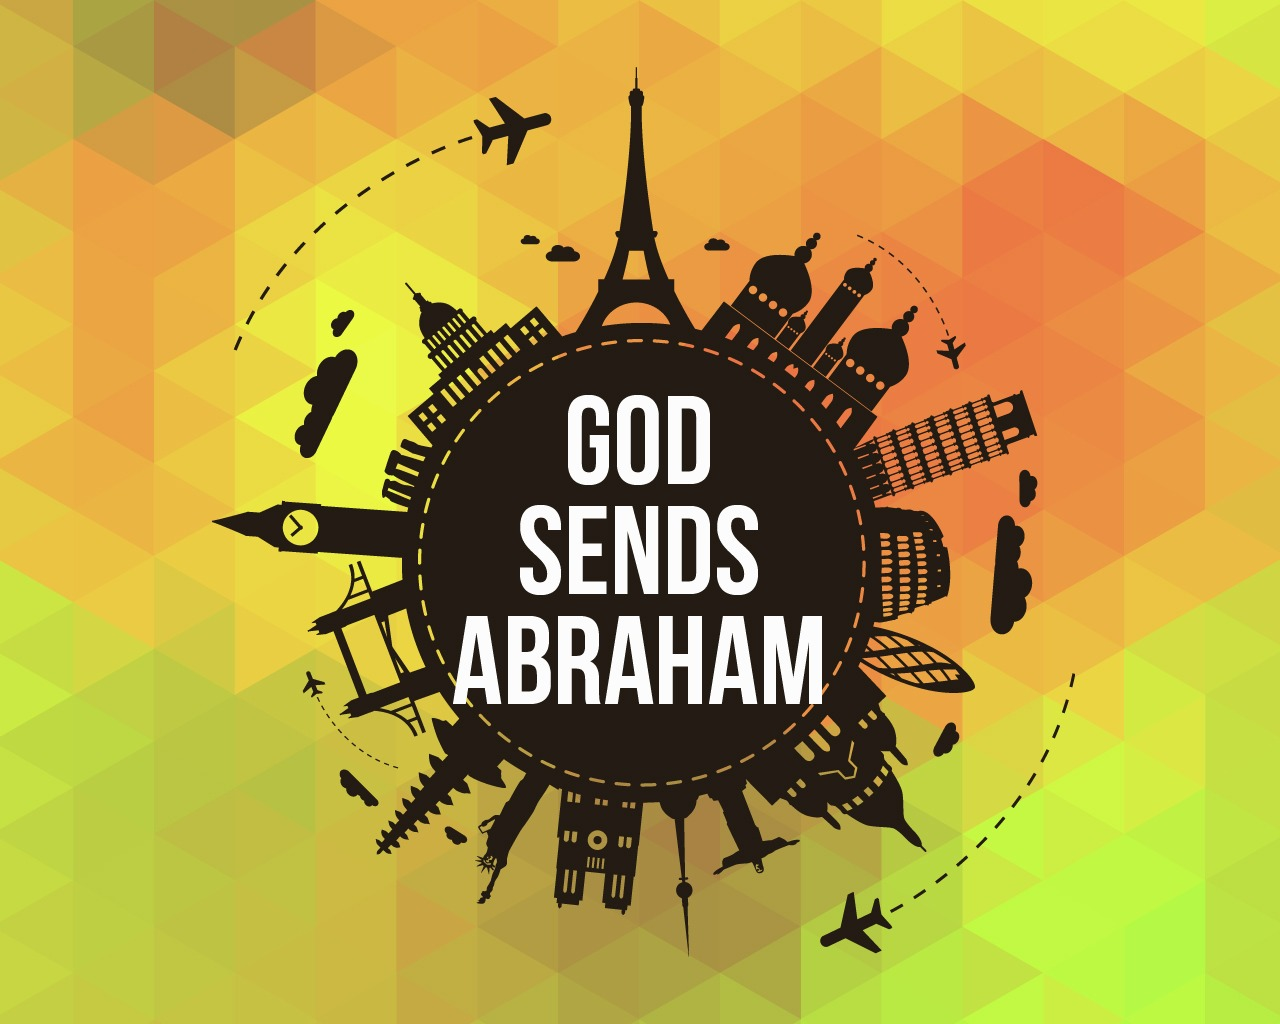 'God Sends Abraham' Sunday School Lesson (Genesis 22:1-19)